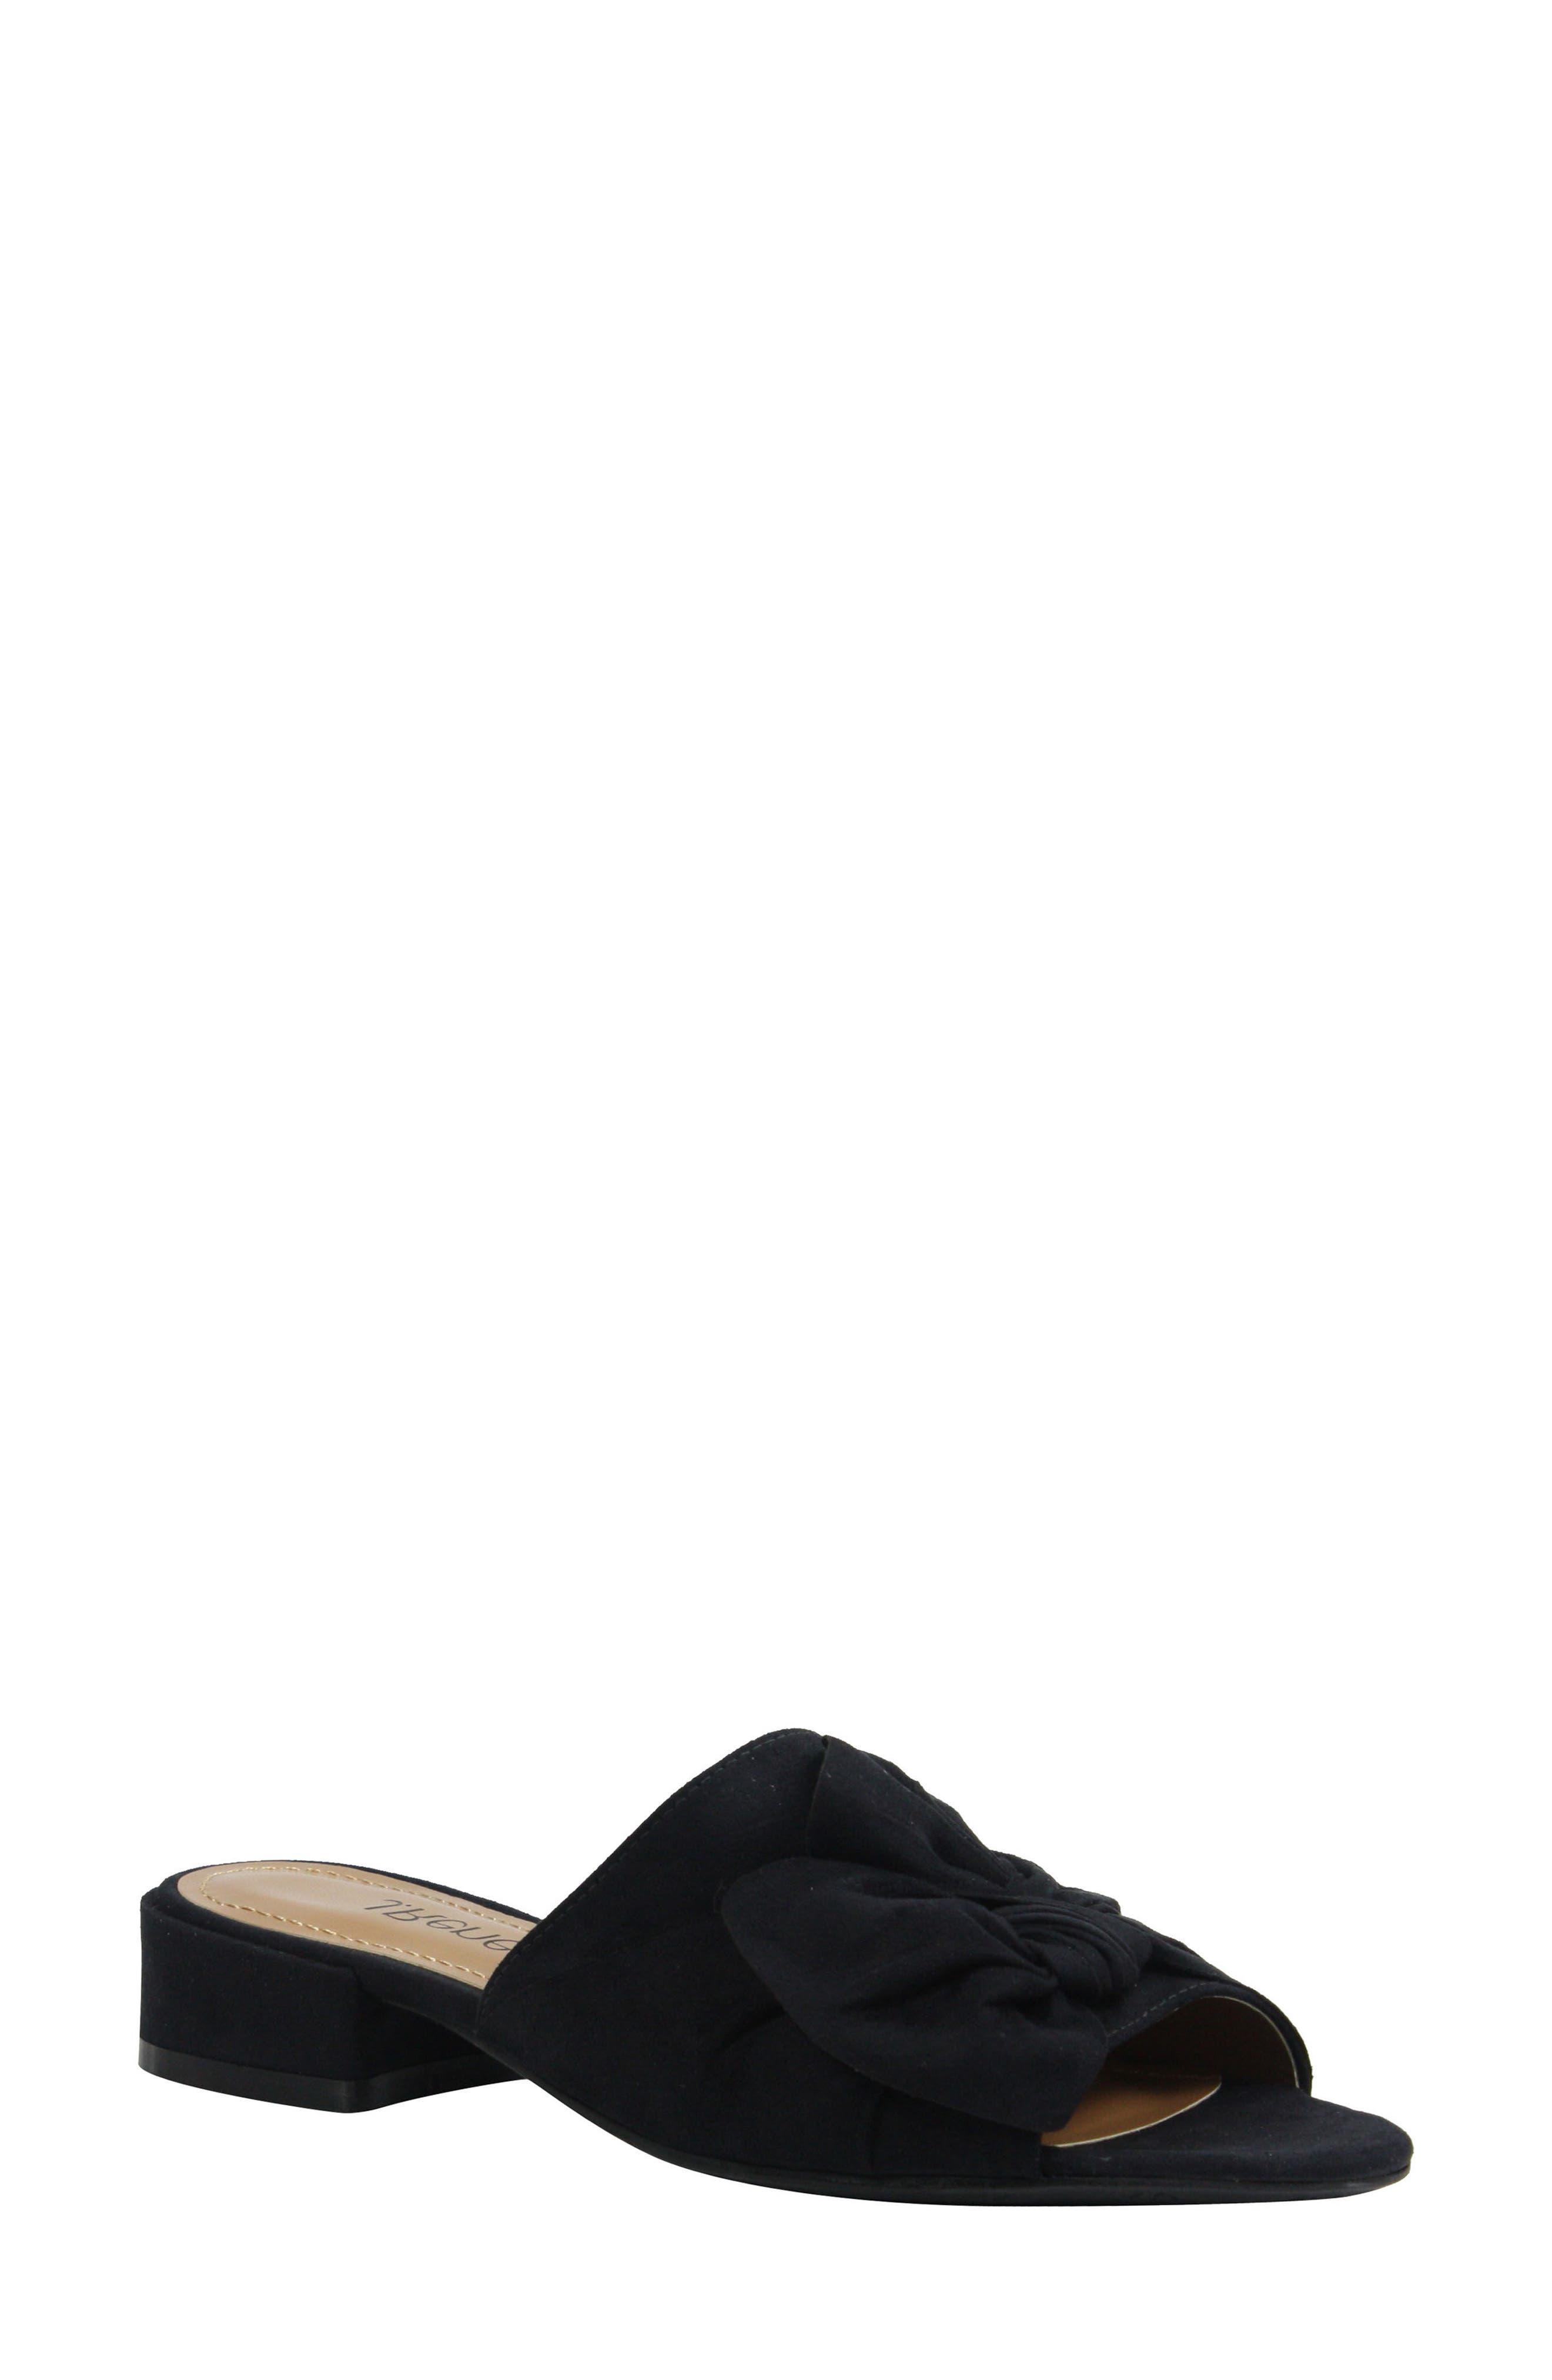 Sattuck Slide Sandal,                         Main,                         color, BLACK FABRIC